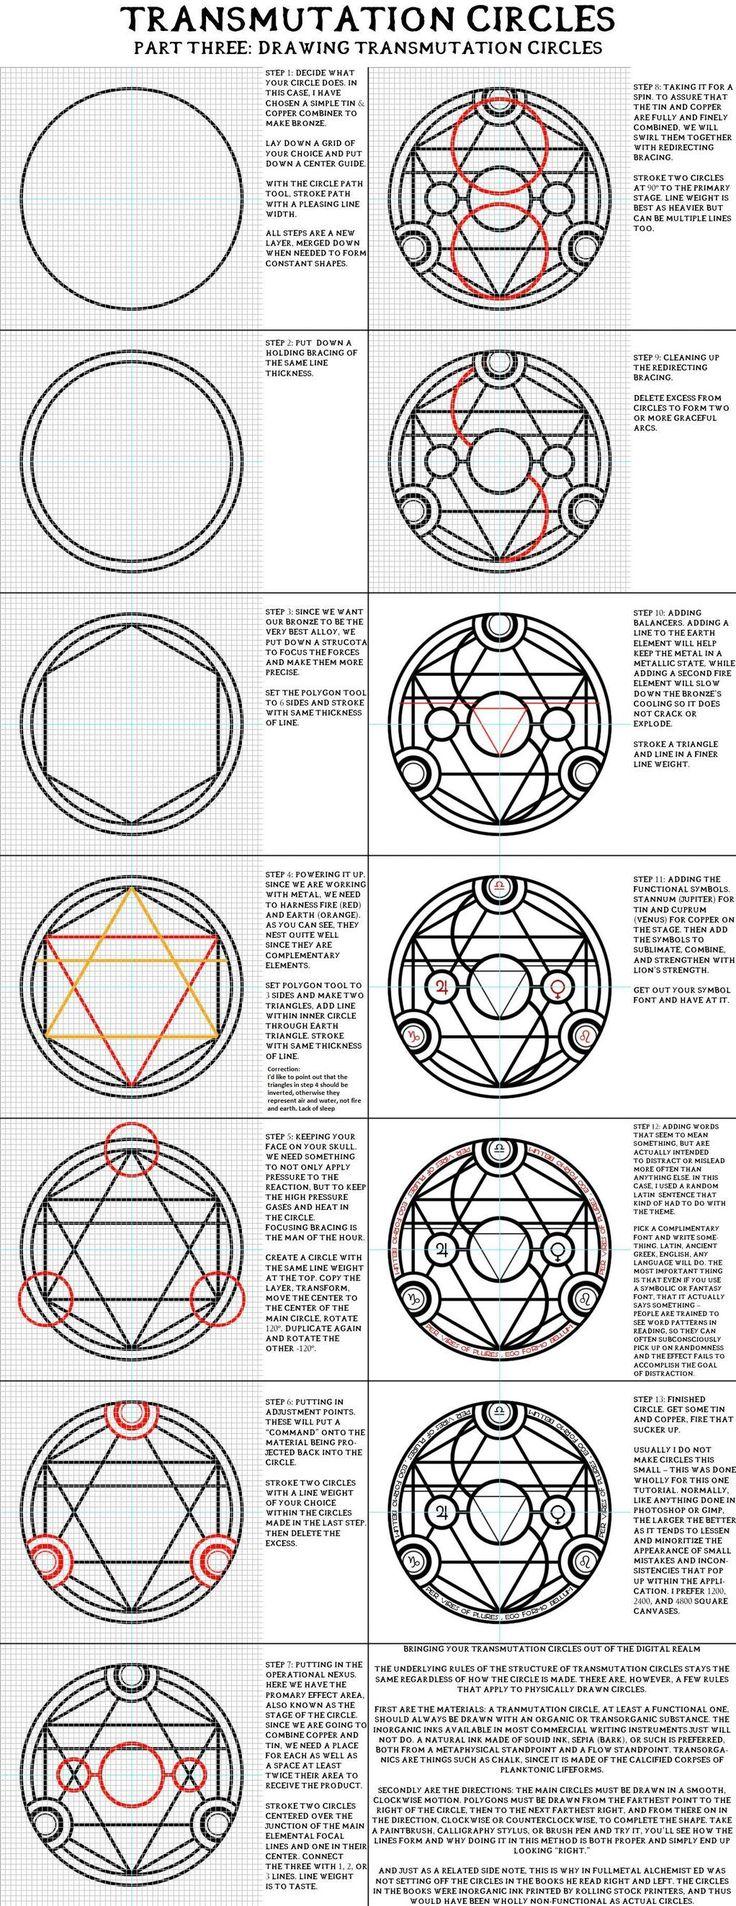 "Transmutation Circles, ""Part Three: Drawing Transmutation Circles"". Full Metal Alchemist / Hagane No Renkinjutsushi"